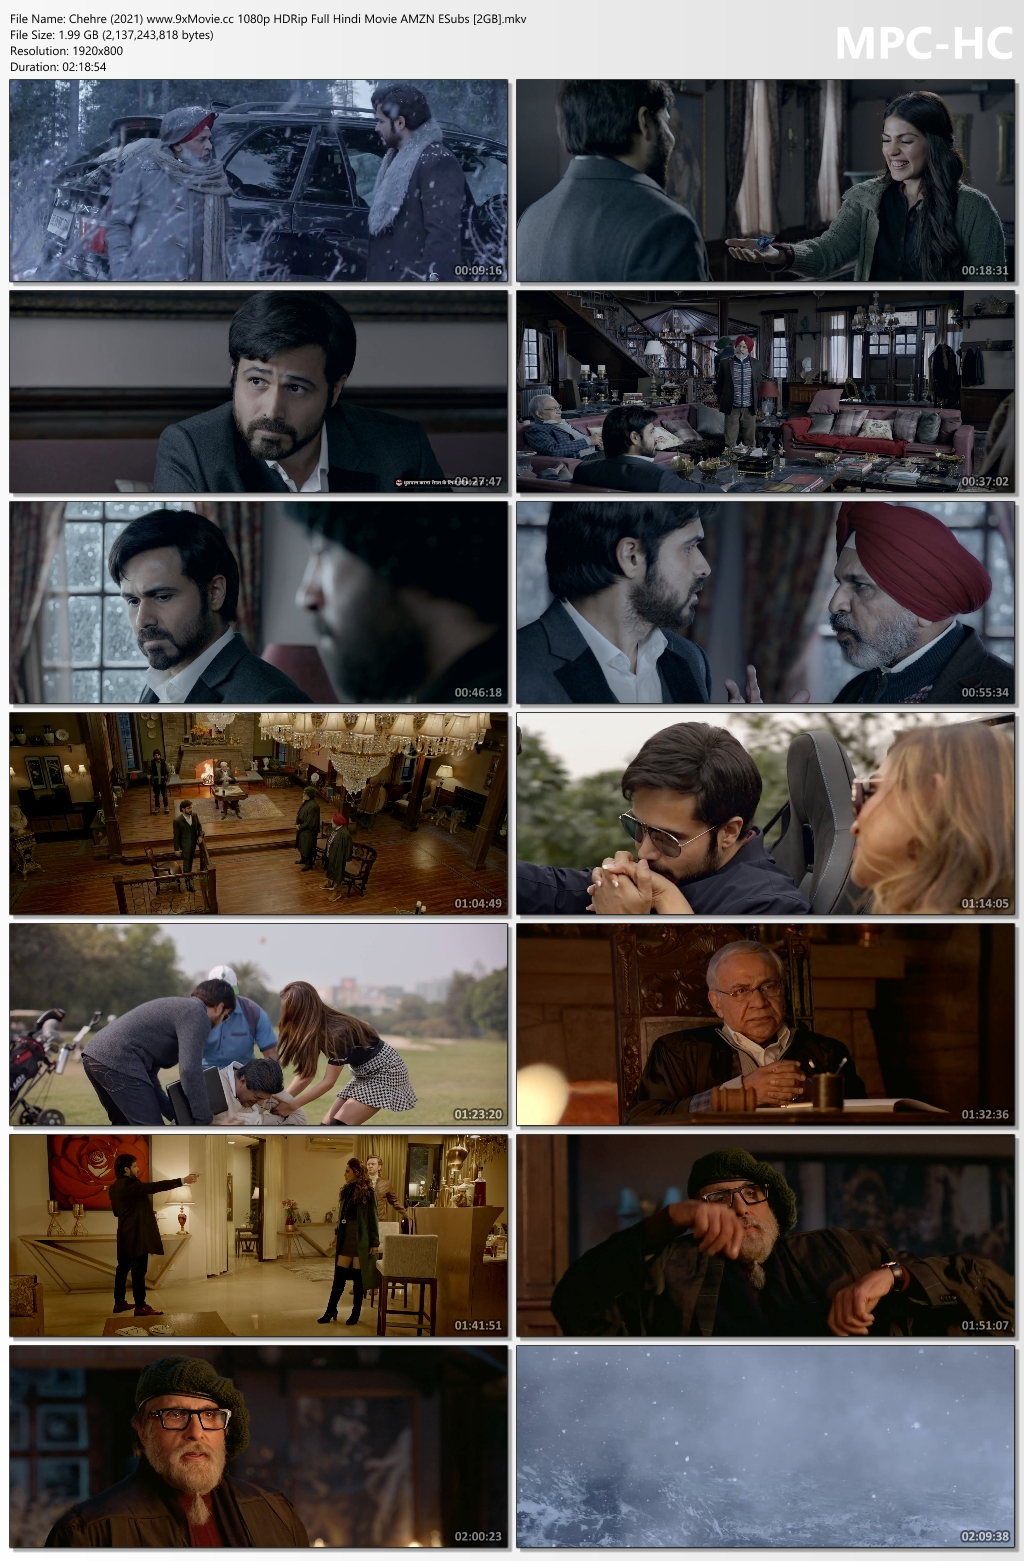 Chehre-2021-www-9x-Movie-cc-1080p-HDRip-Full-Hindi-Movie-AMZN-ESubs-2-GB-mkv